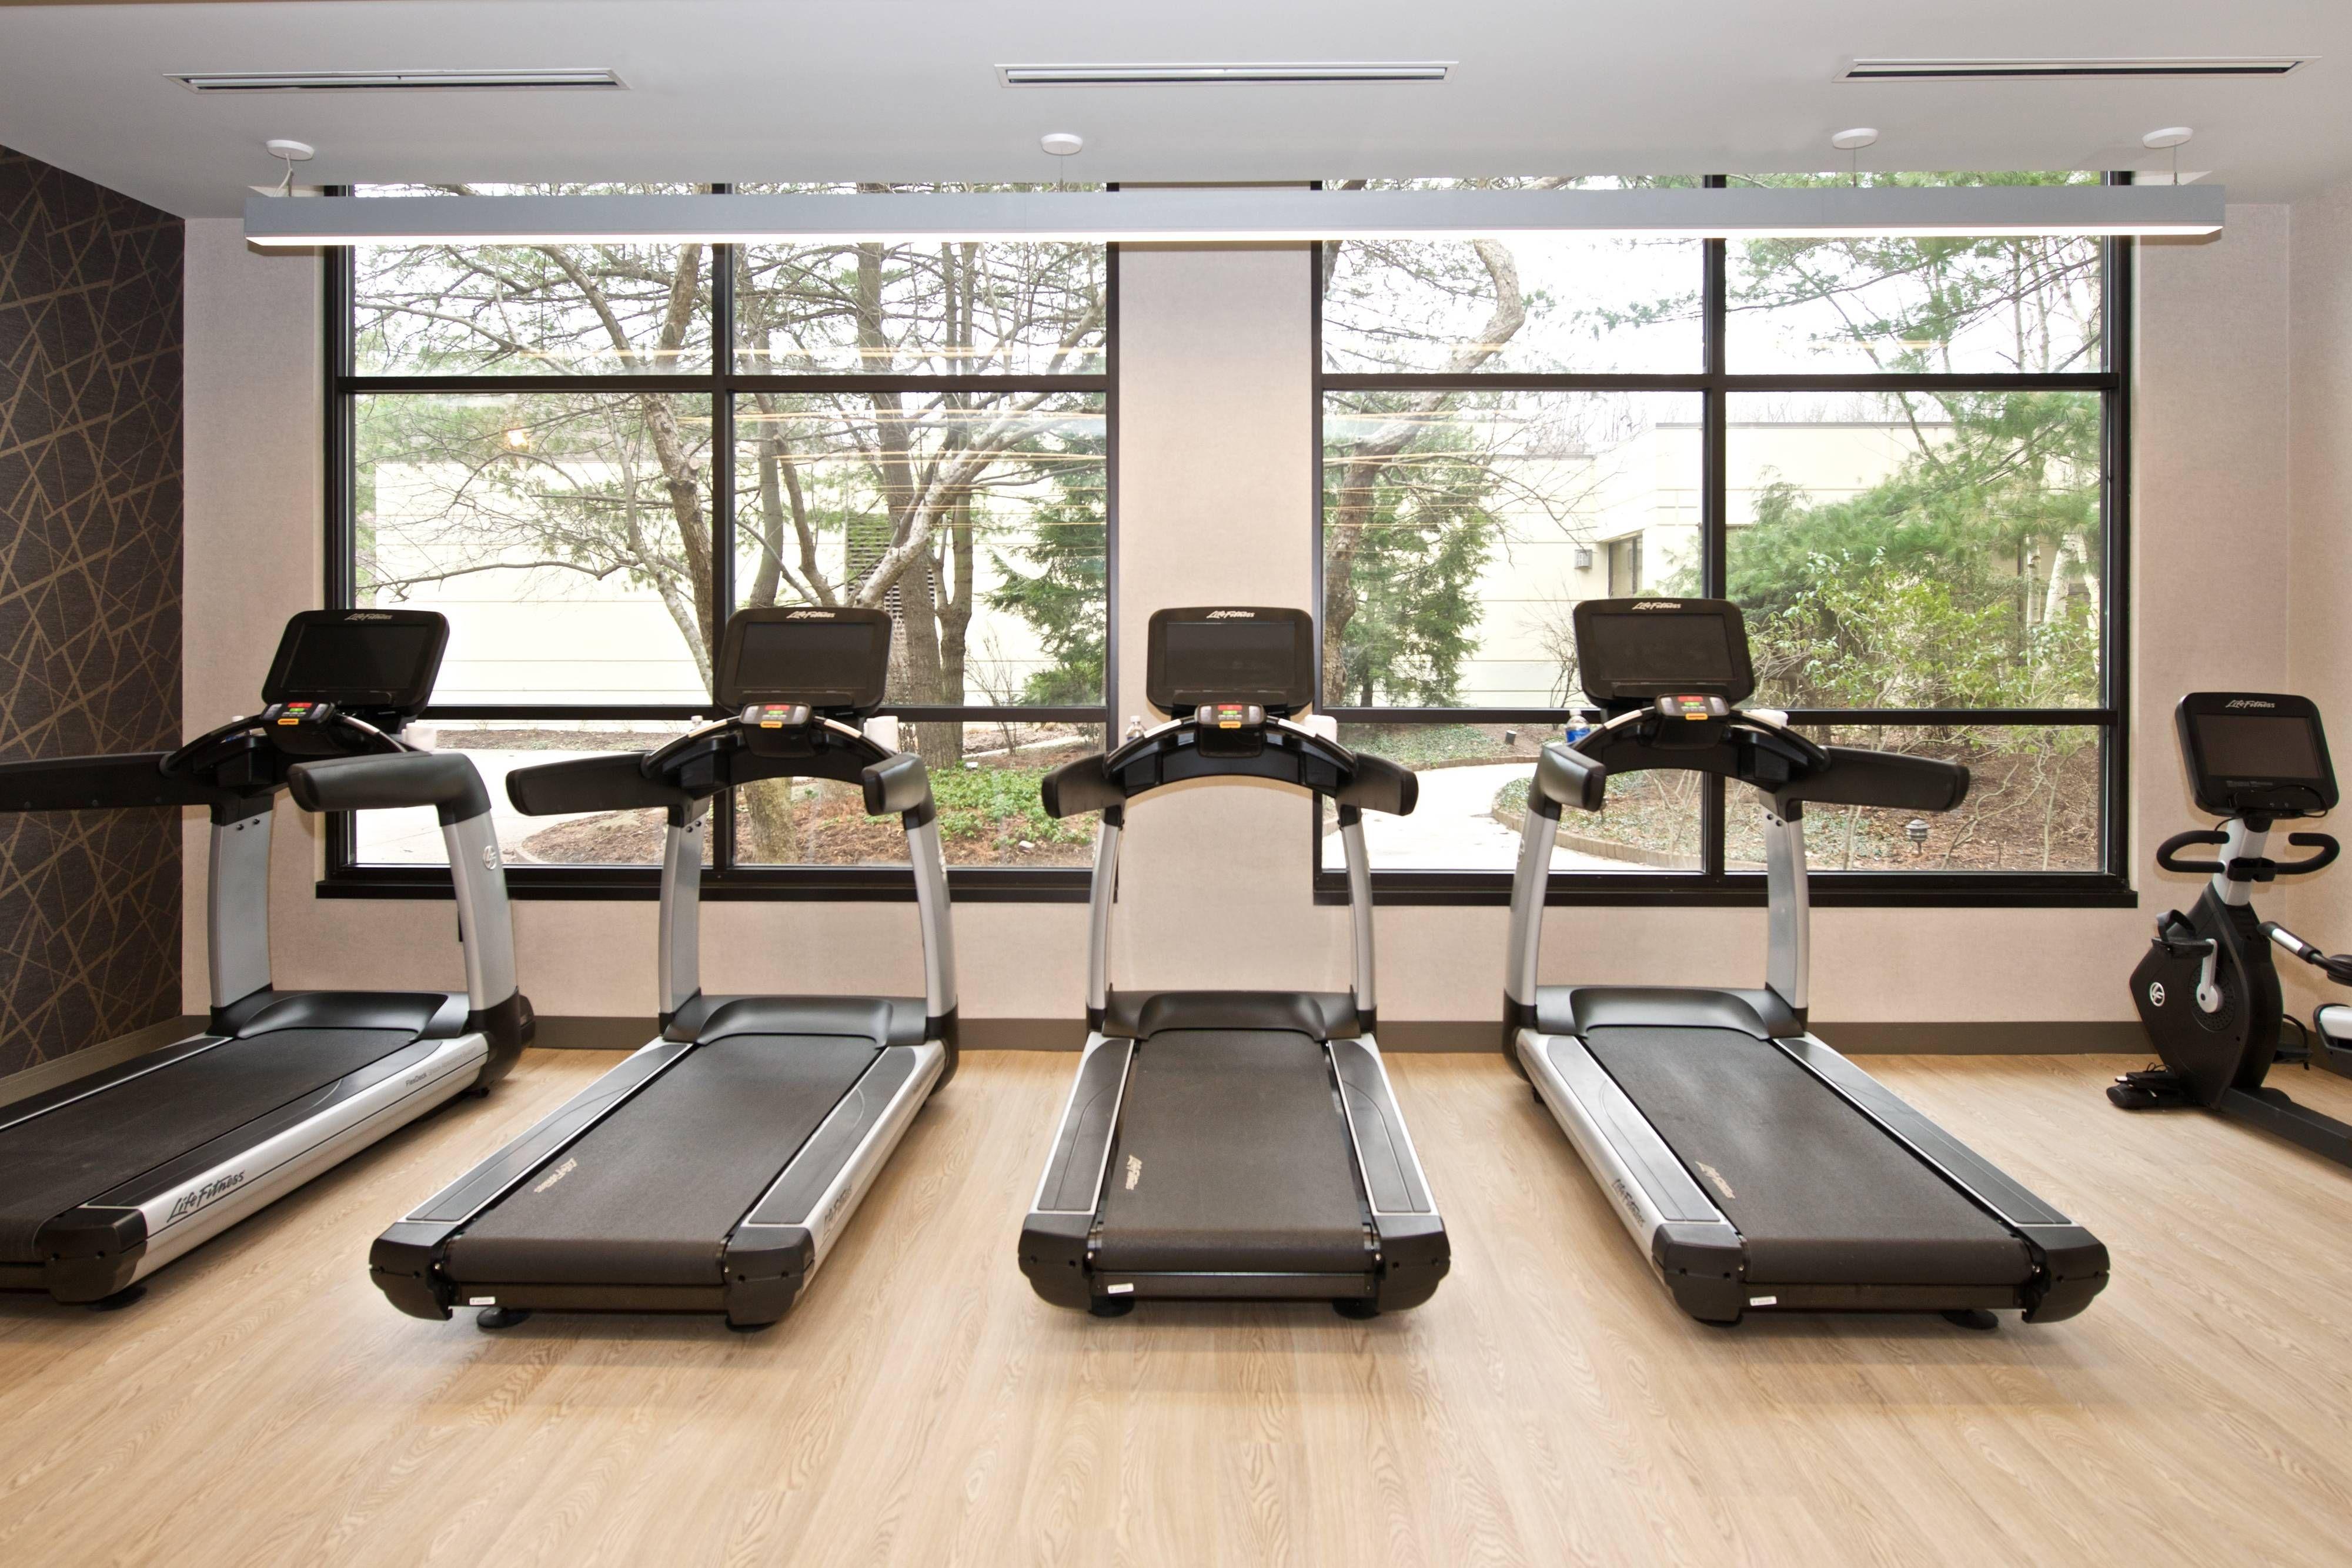 Pittsburgh Airport Marriott Fitness Center - Cardio